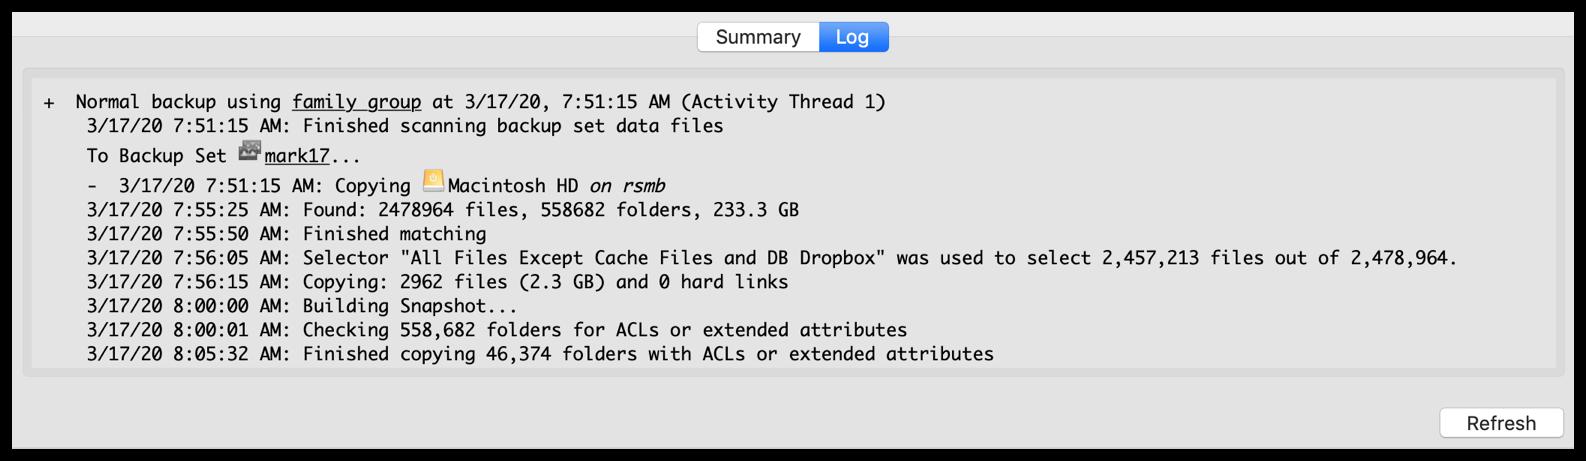 mac_operations_activities_log.png